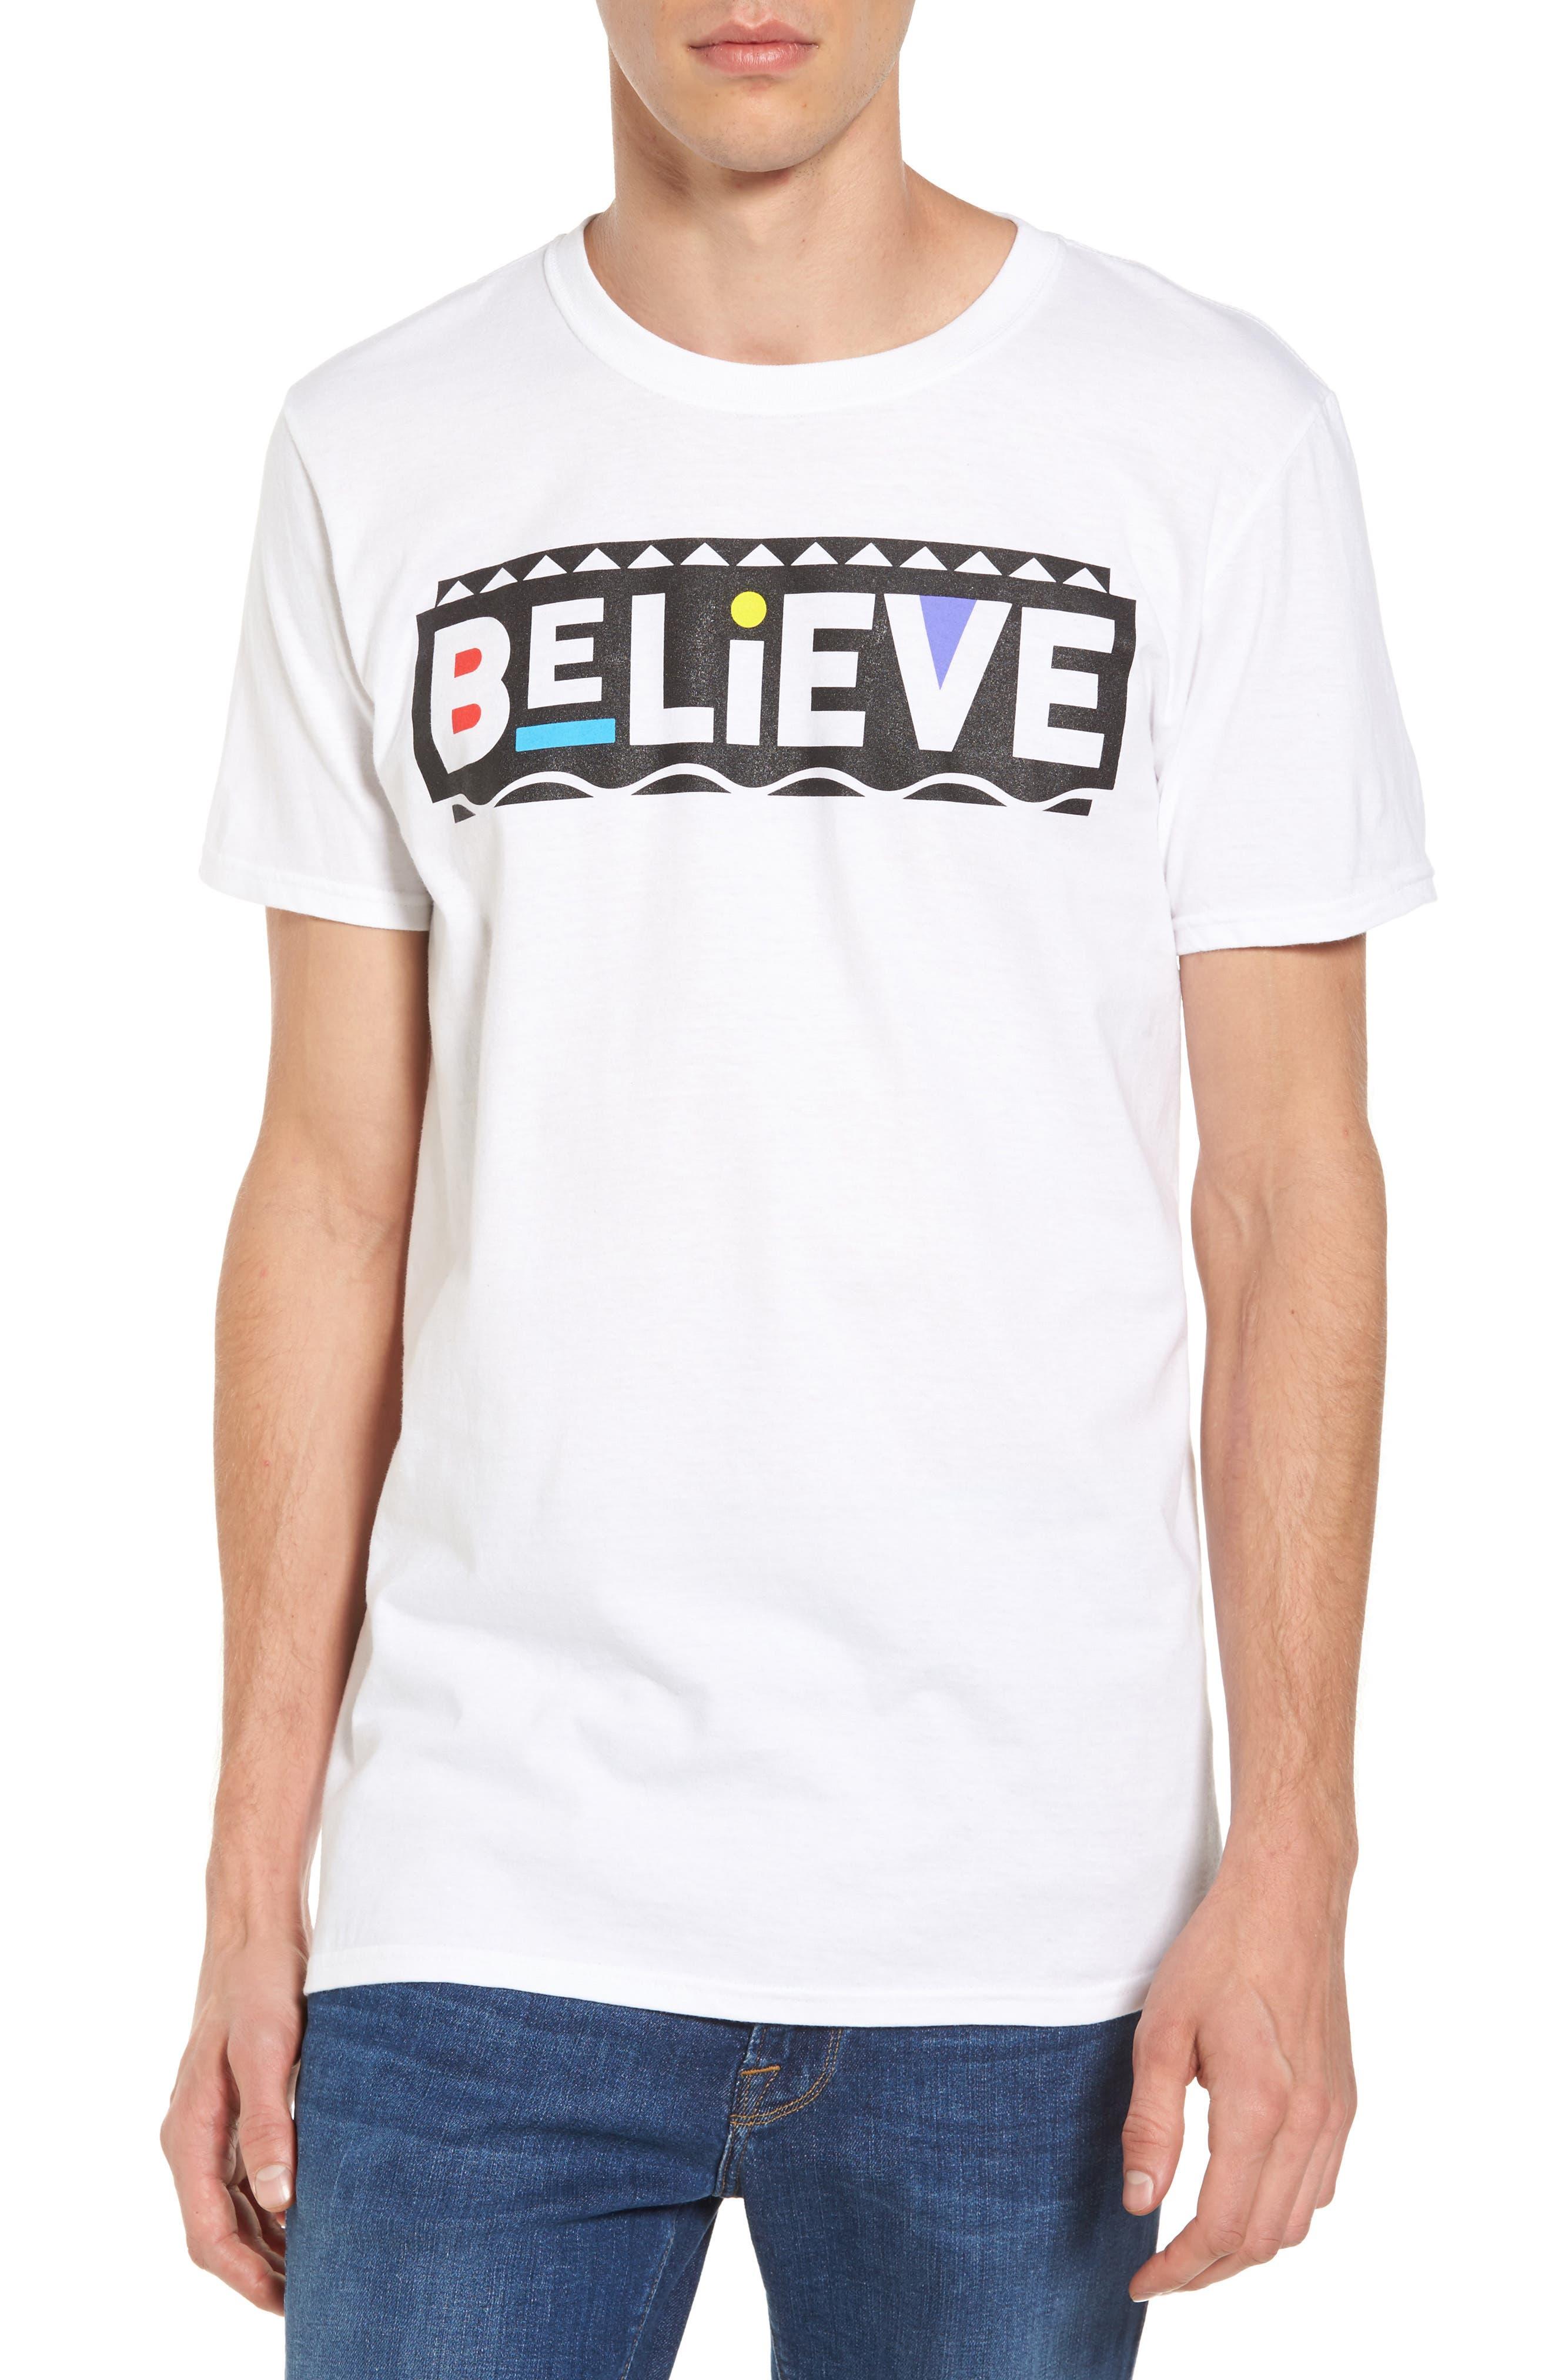 Believe T-Shirt,                         Main,                         color, White